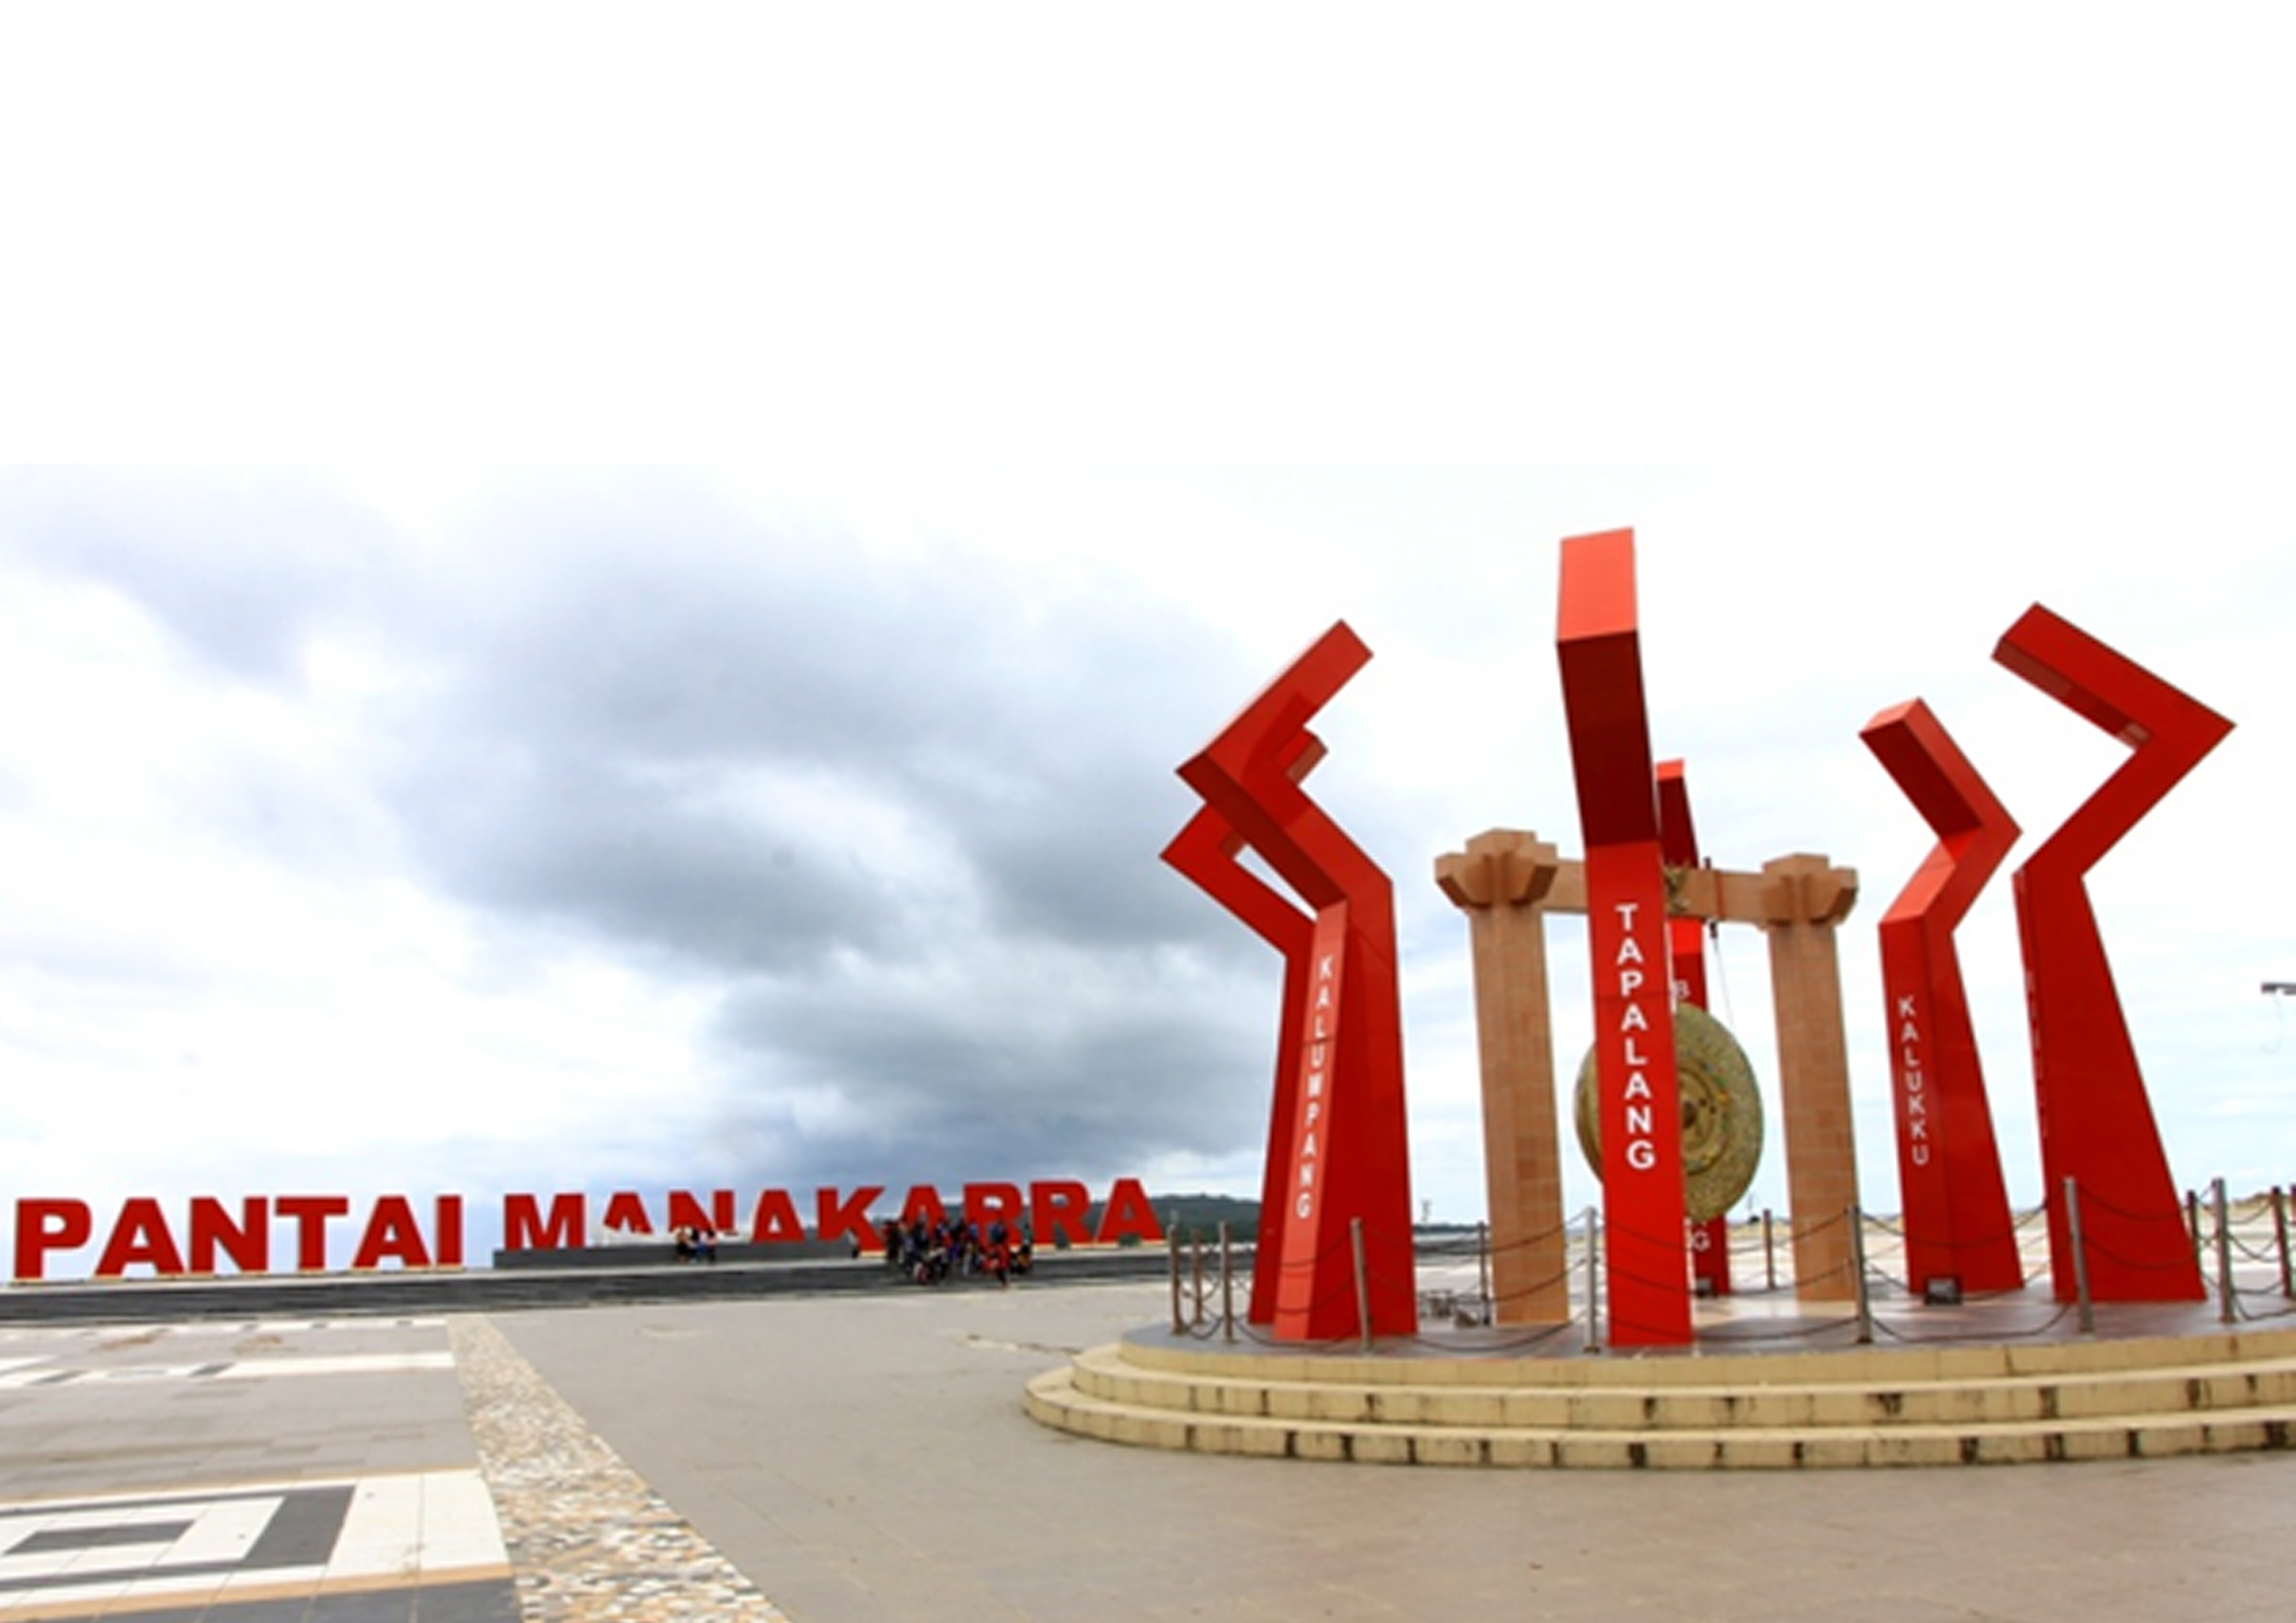 Badan Penghubung Sulbar Pariwisata Provinsi Sulawesi Barat Pantai Manakarra Labuang